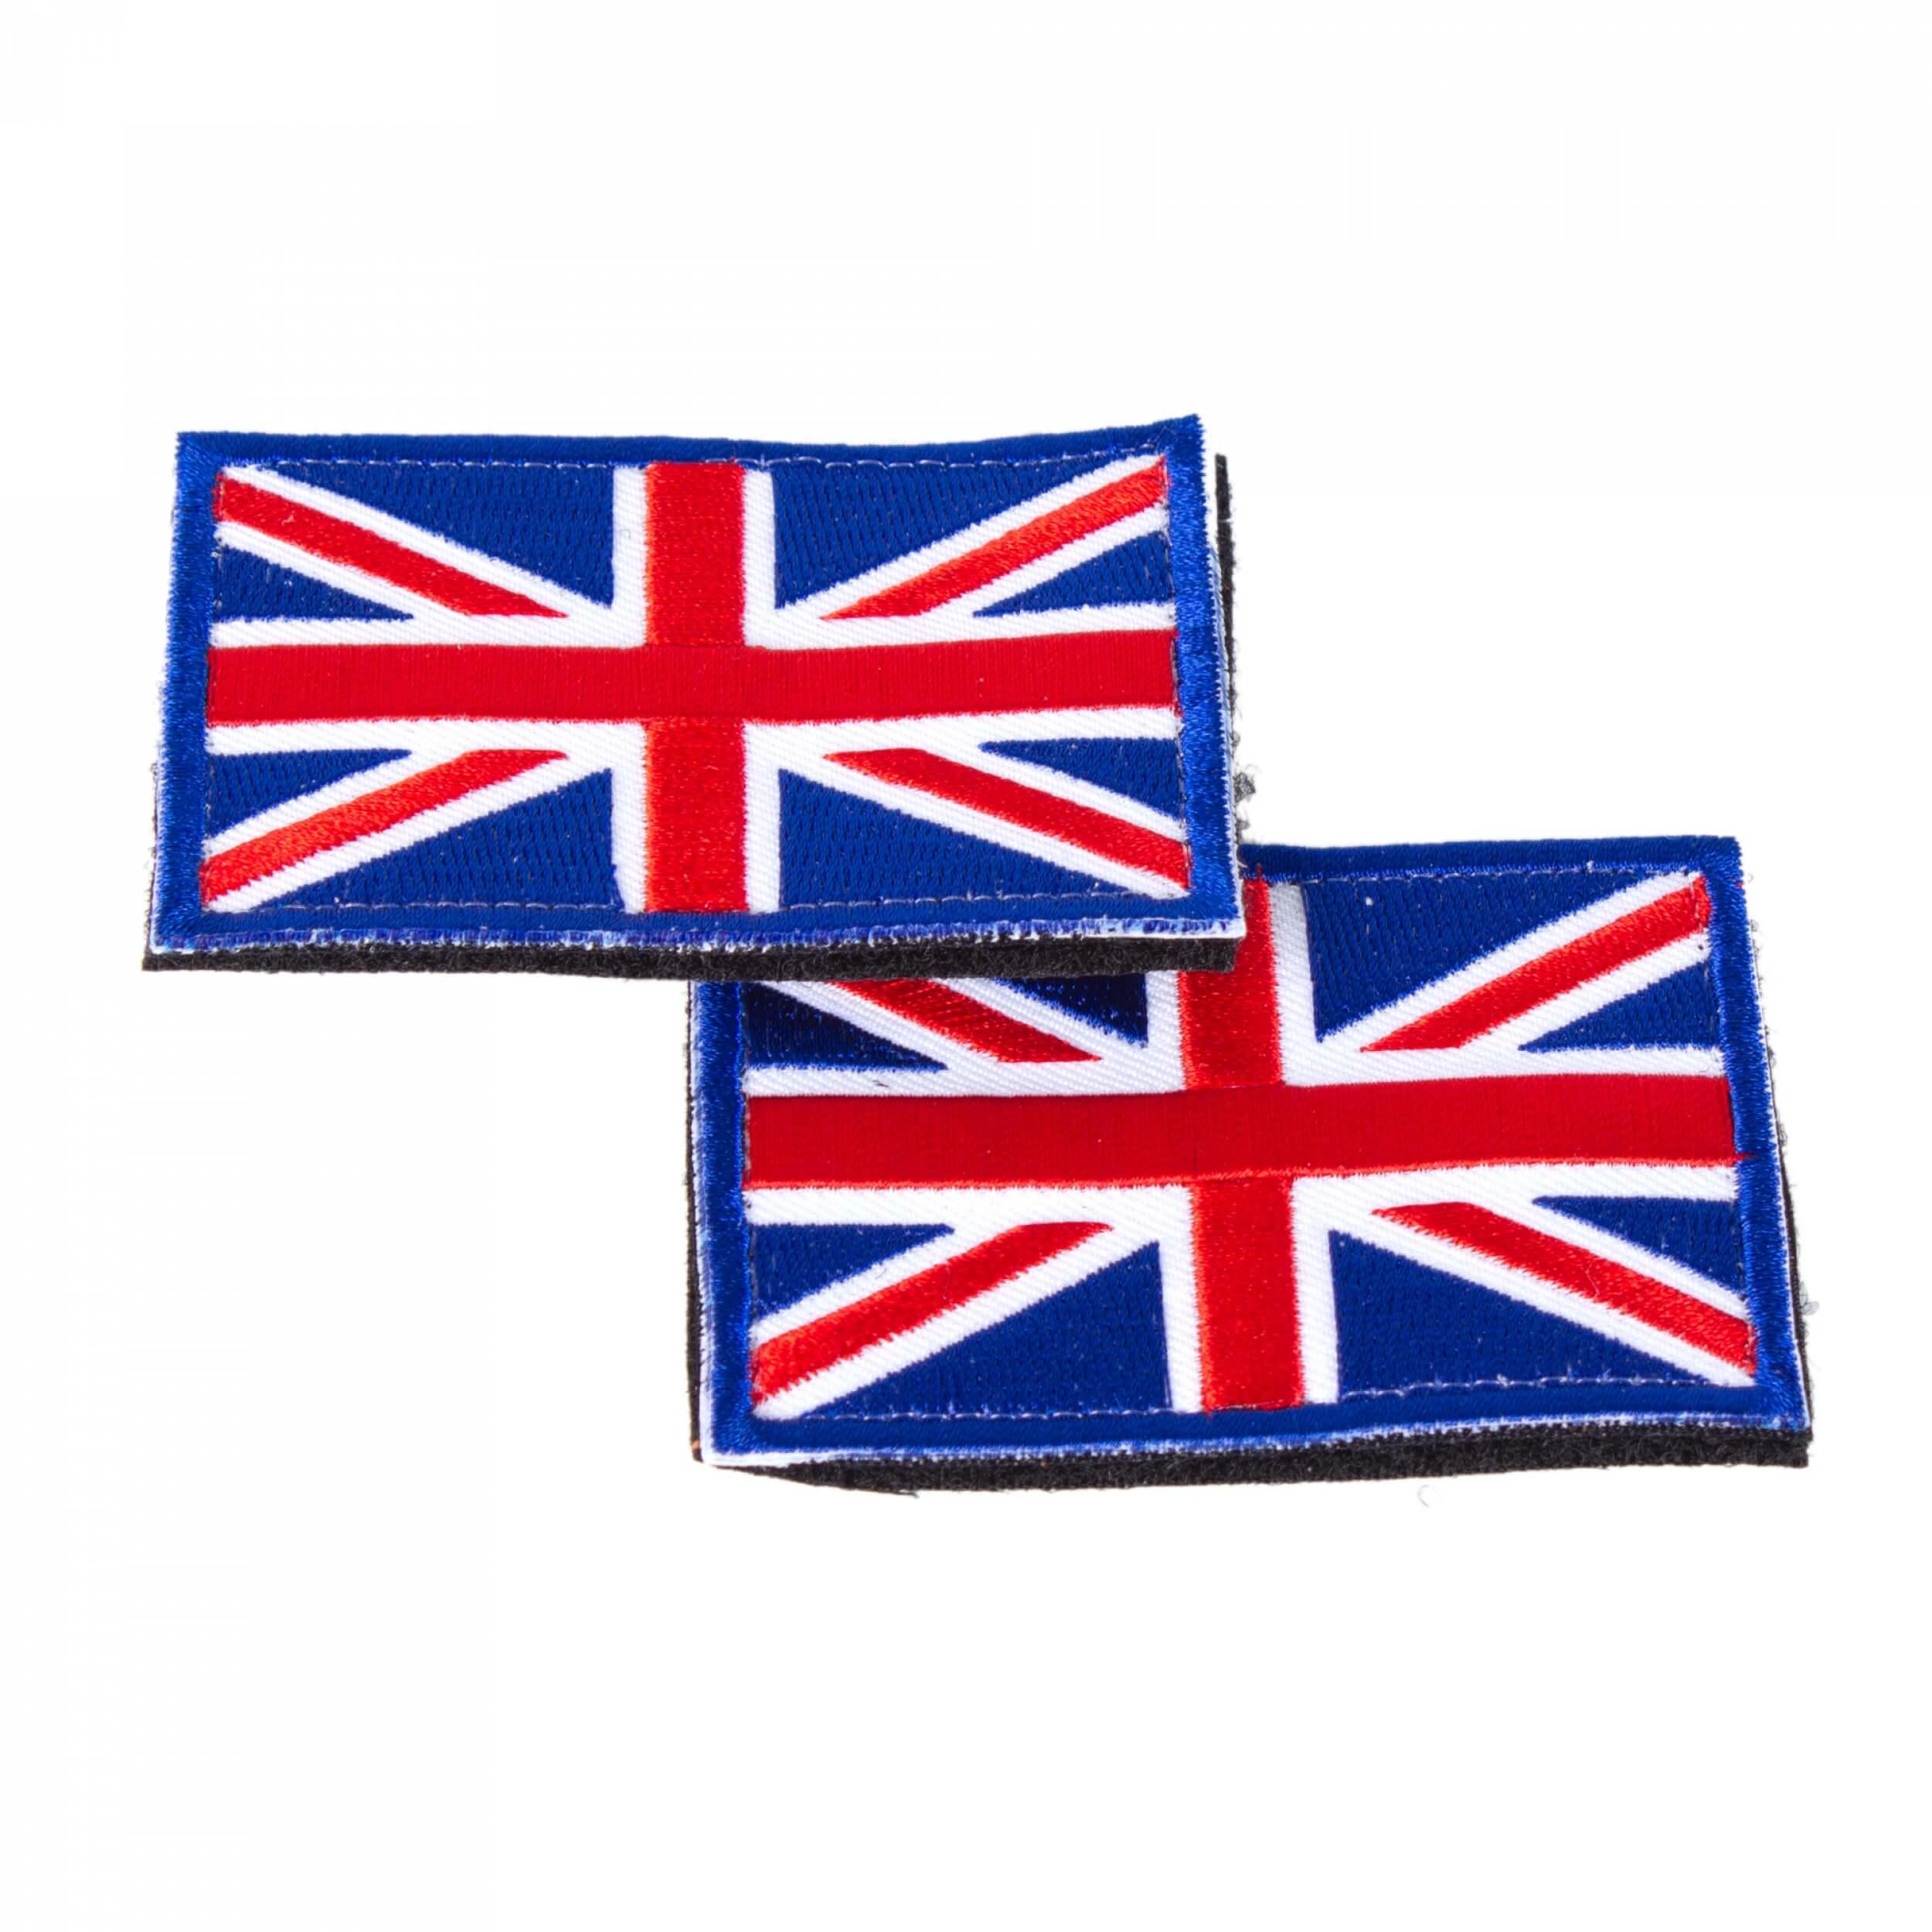 England United Kingdom Flagge Patch 8 x 5 cm 2 Stück im Set